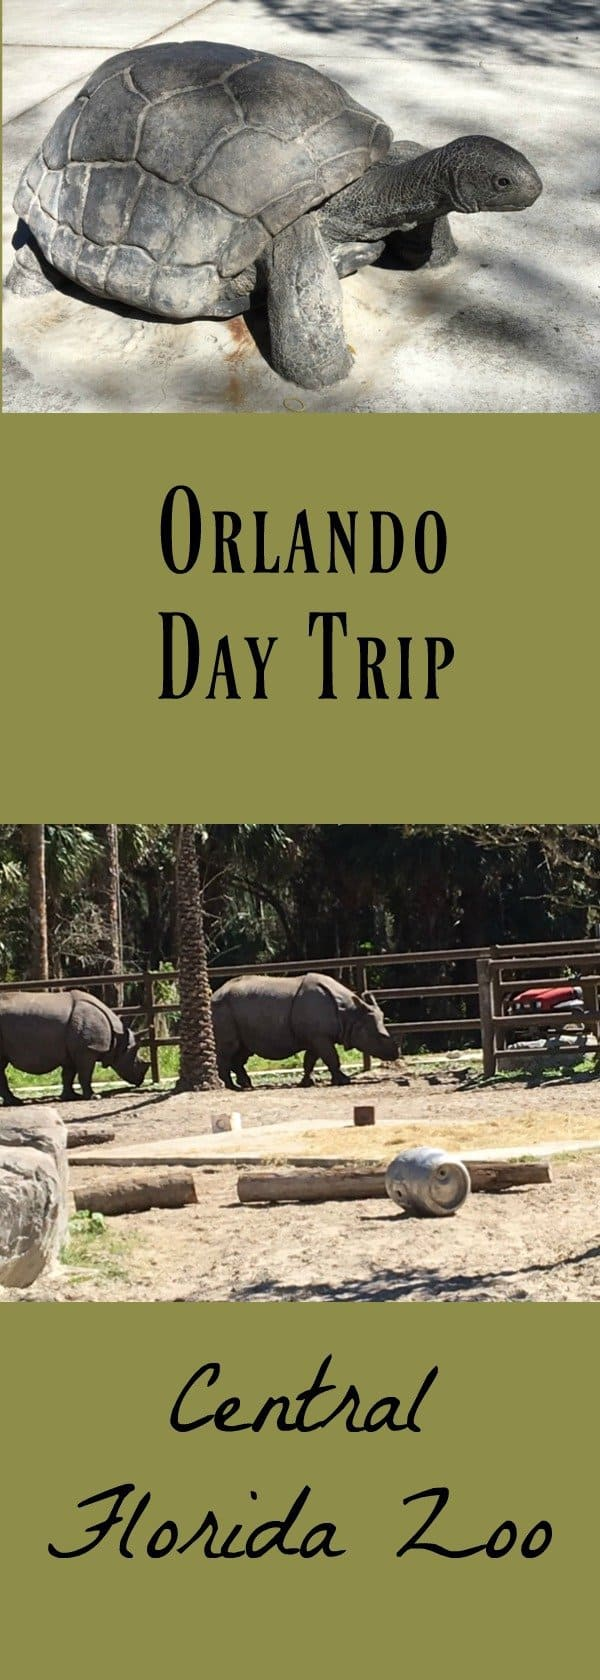 Orlando Day Trip